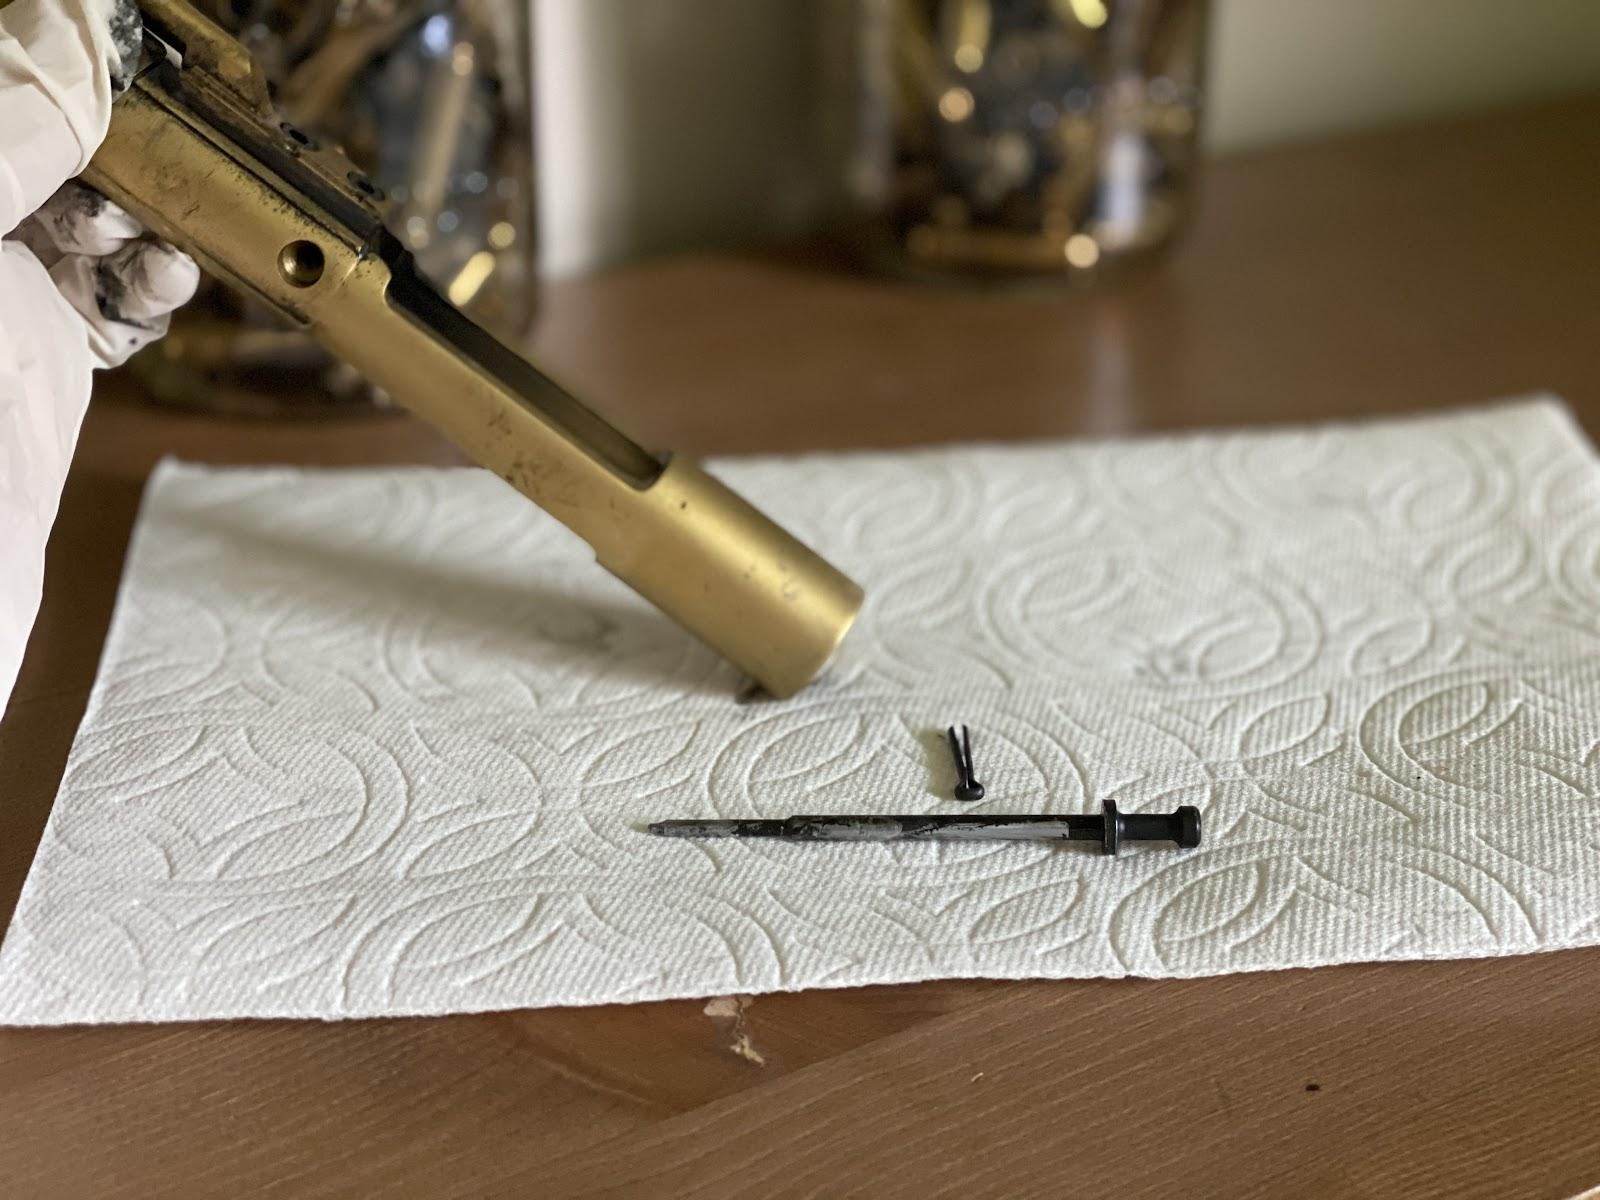 removing firing pin